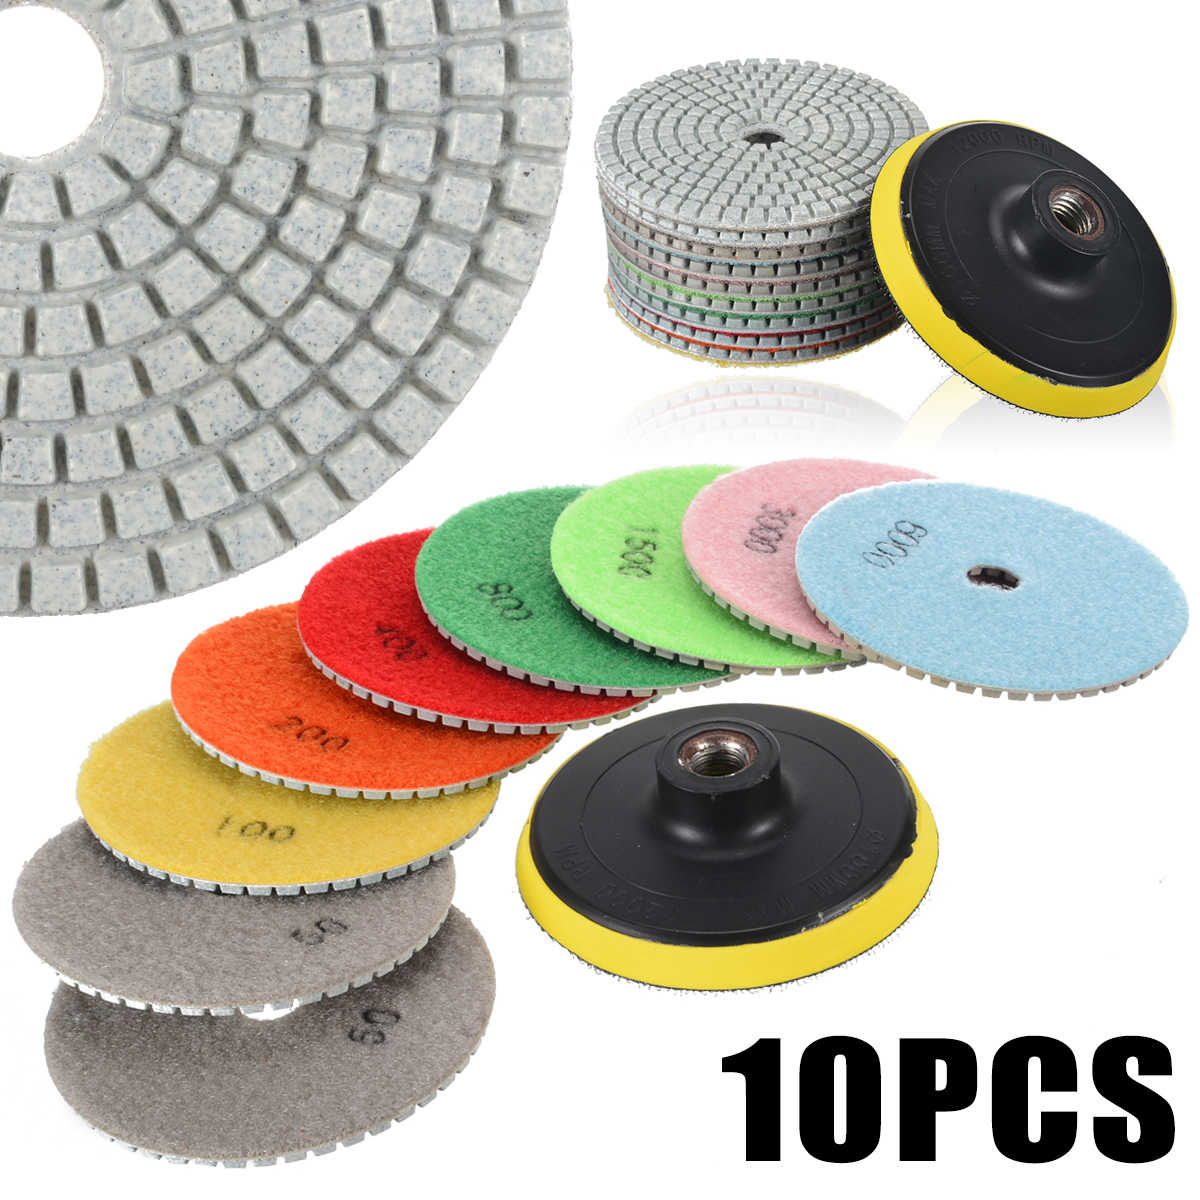 50+100+300+800+1500+2000+3000 Water Mill Sheet Polishing Pad 4 Inch Sticky Disc Marble Diamond Water Polishing Sheet Polishing Pad